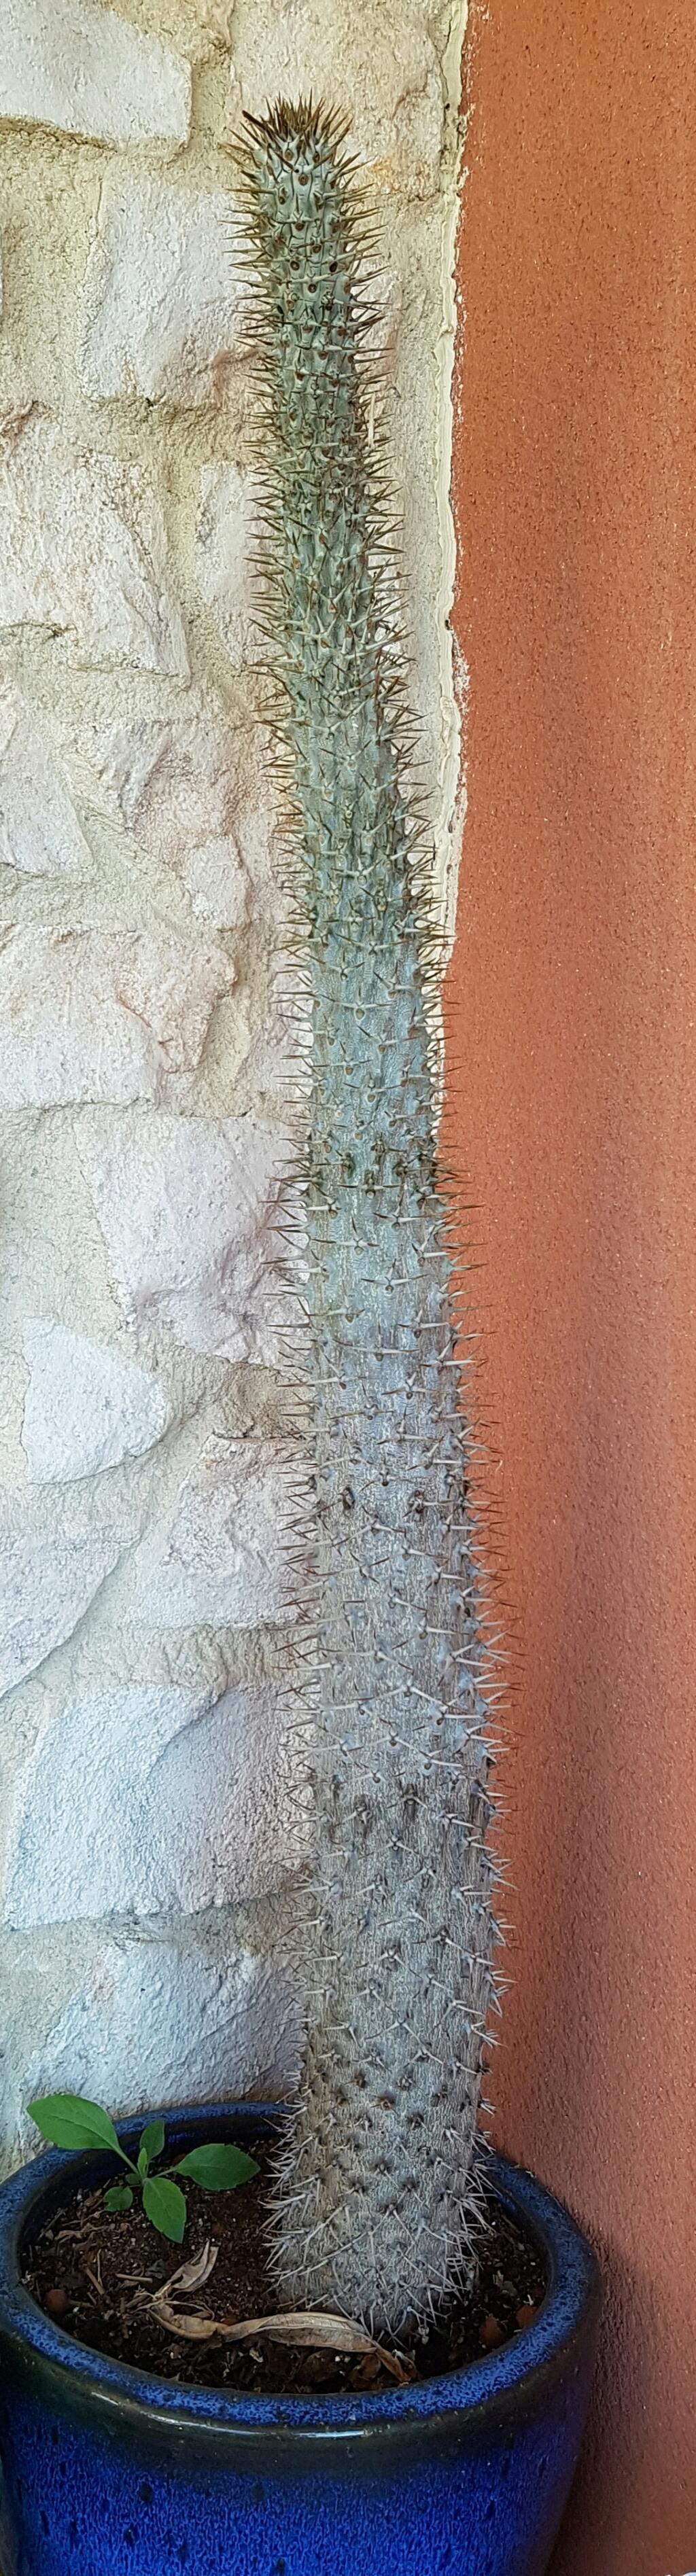 Pachypodium lamerei - Page 4 20210710